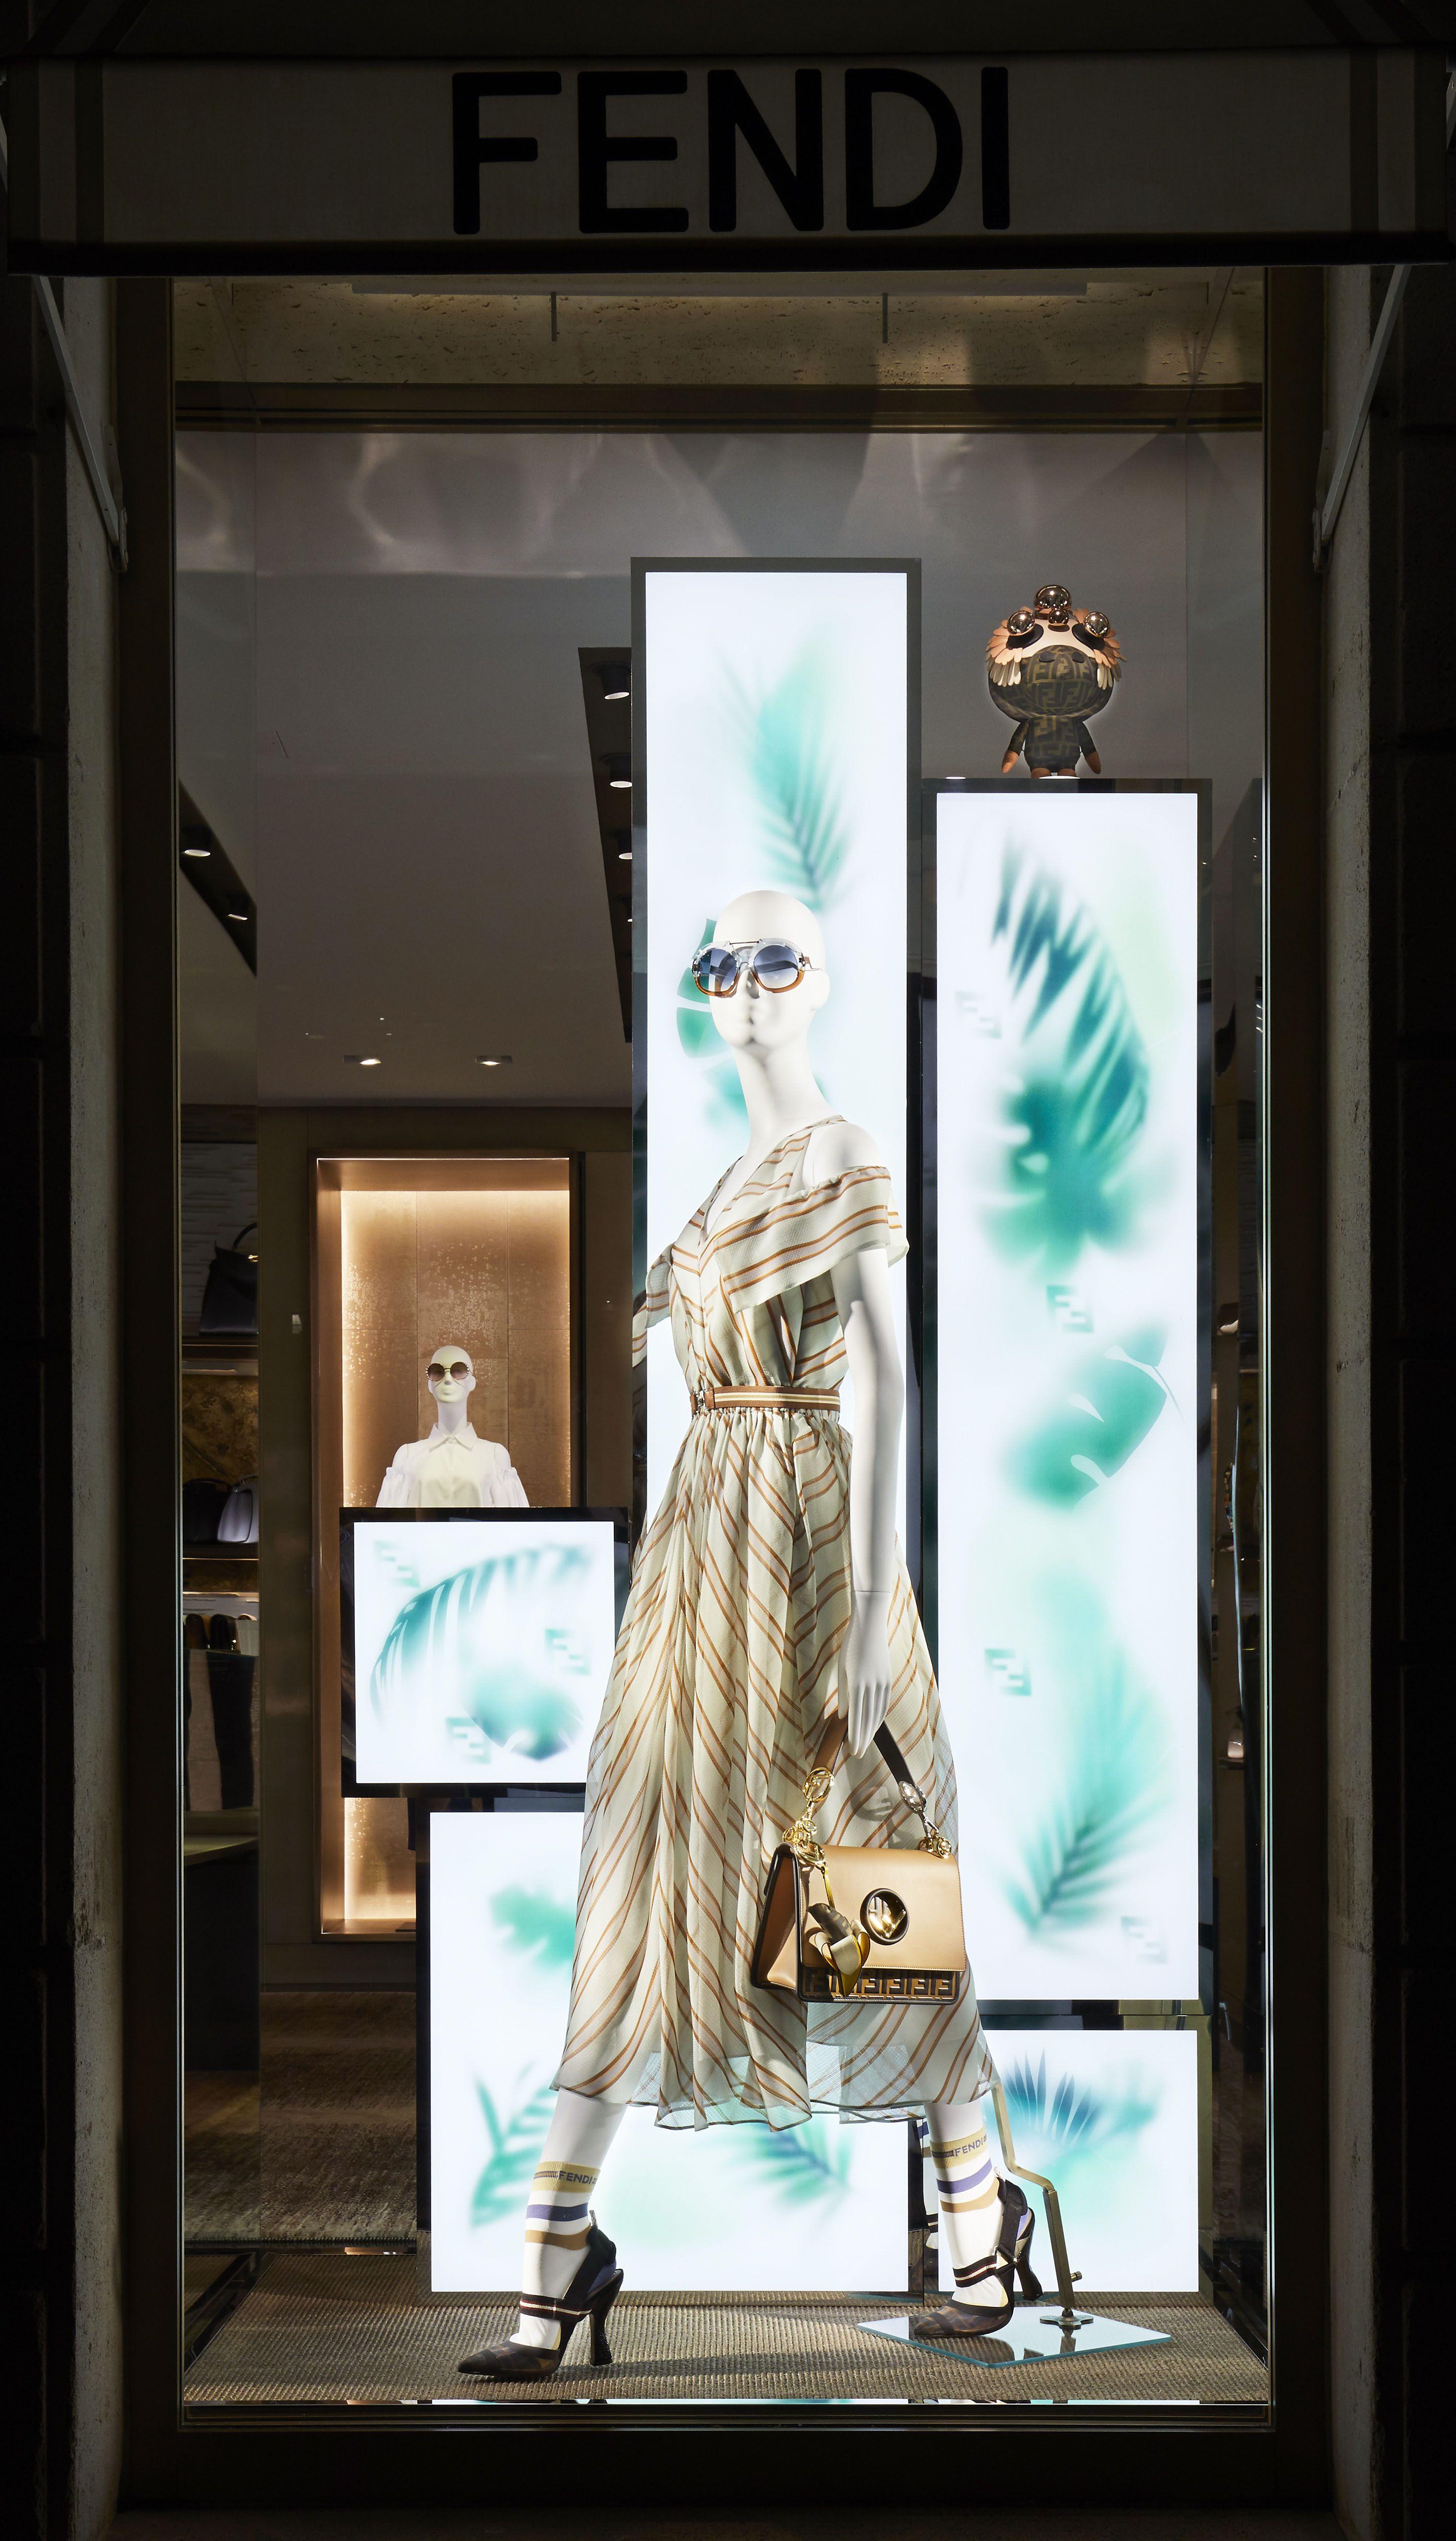 e19664636 Fendi Spring/Summer 2018 Windows - Paris, France | My fashions in ...